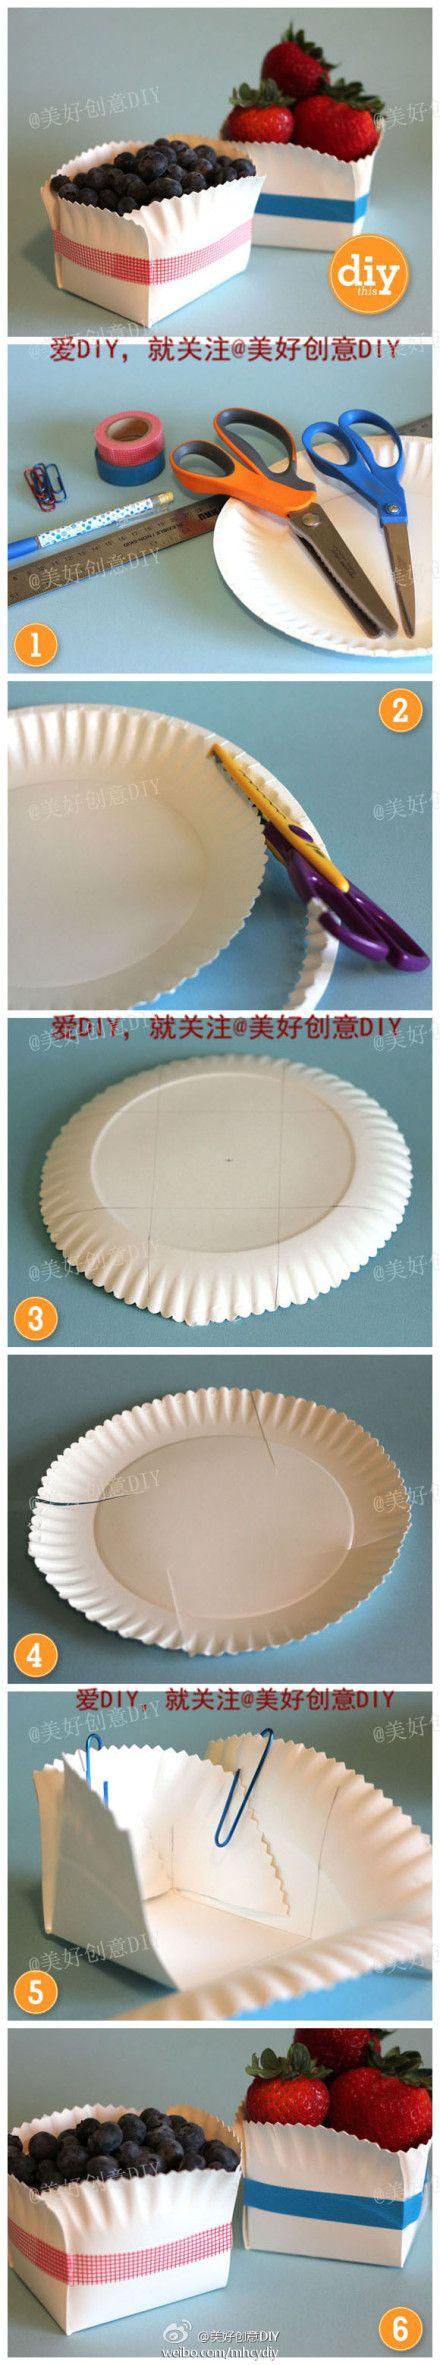 diy: paper plate boxes...